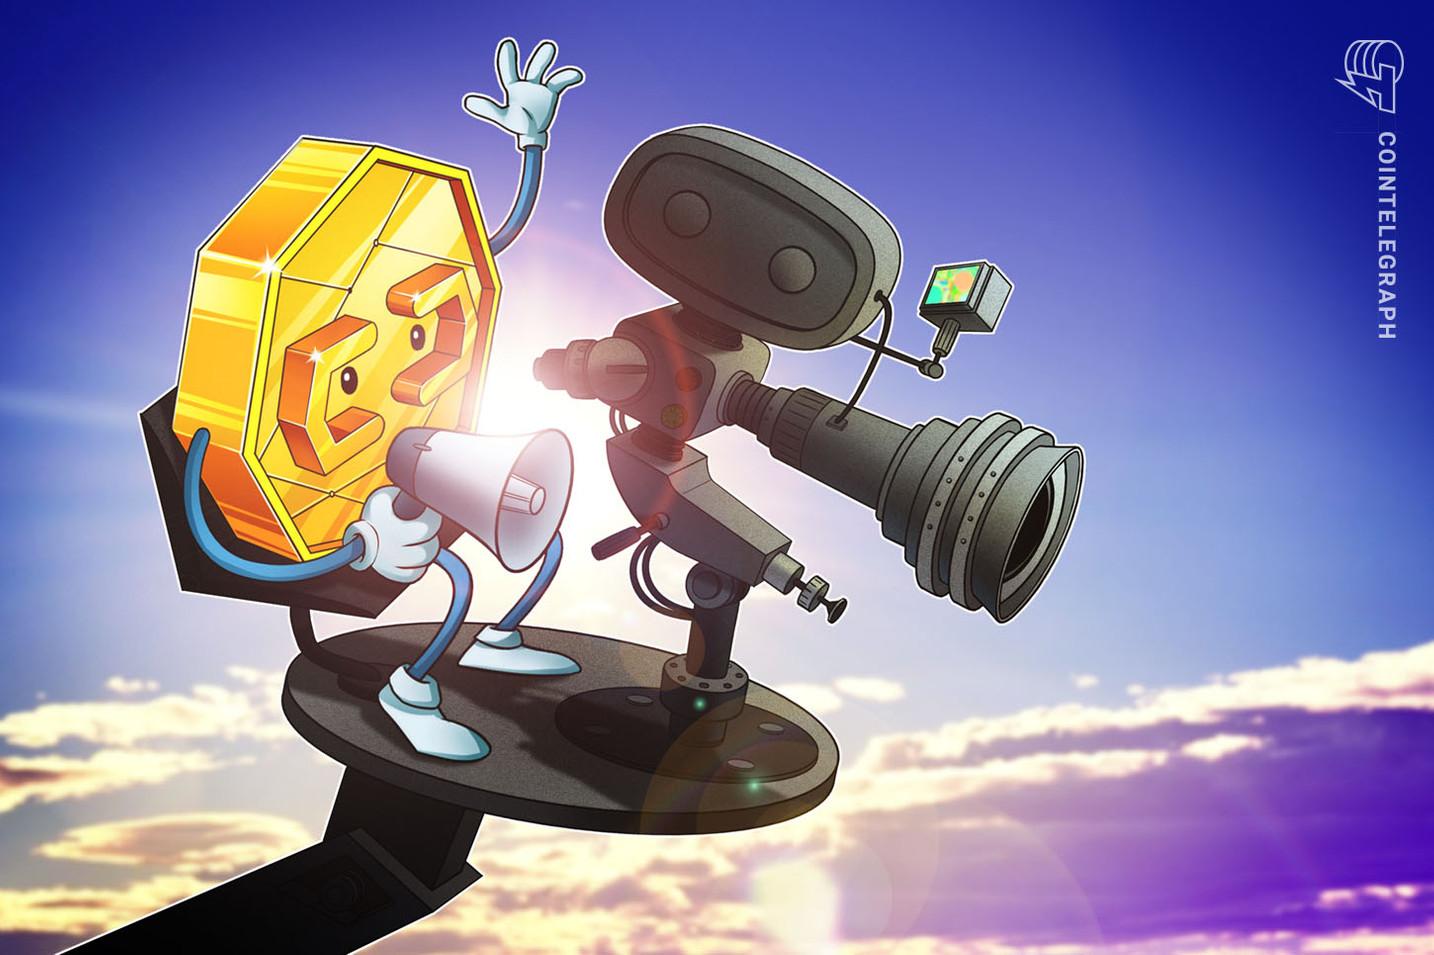 Tone Vays y Charlie Burton discuten sobre Bitcoin en vivo en Cointelegraph